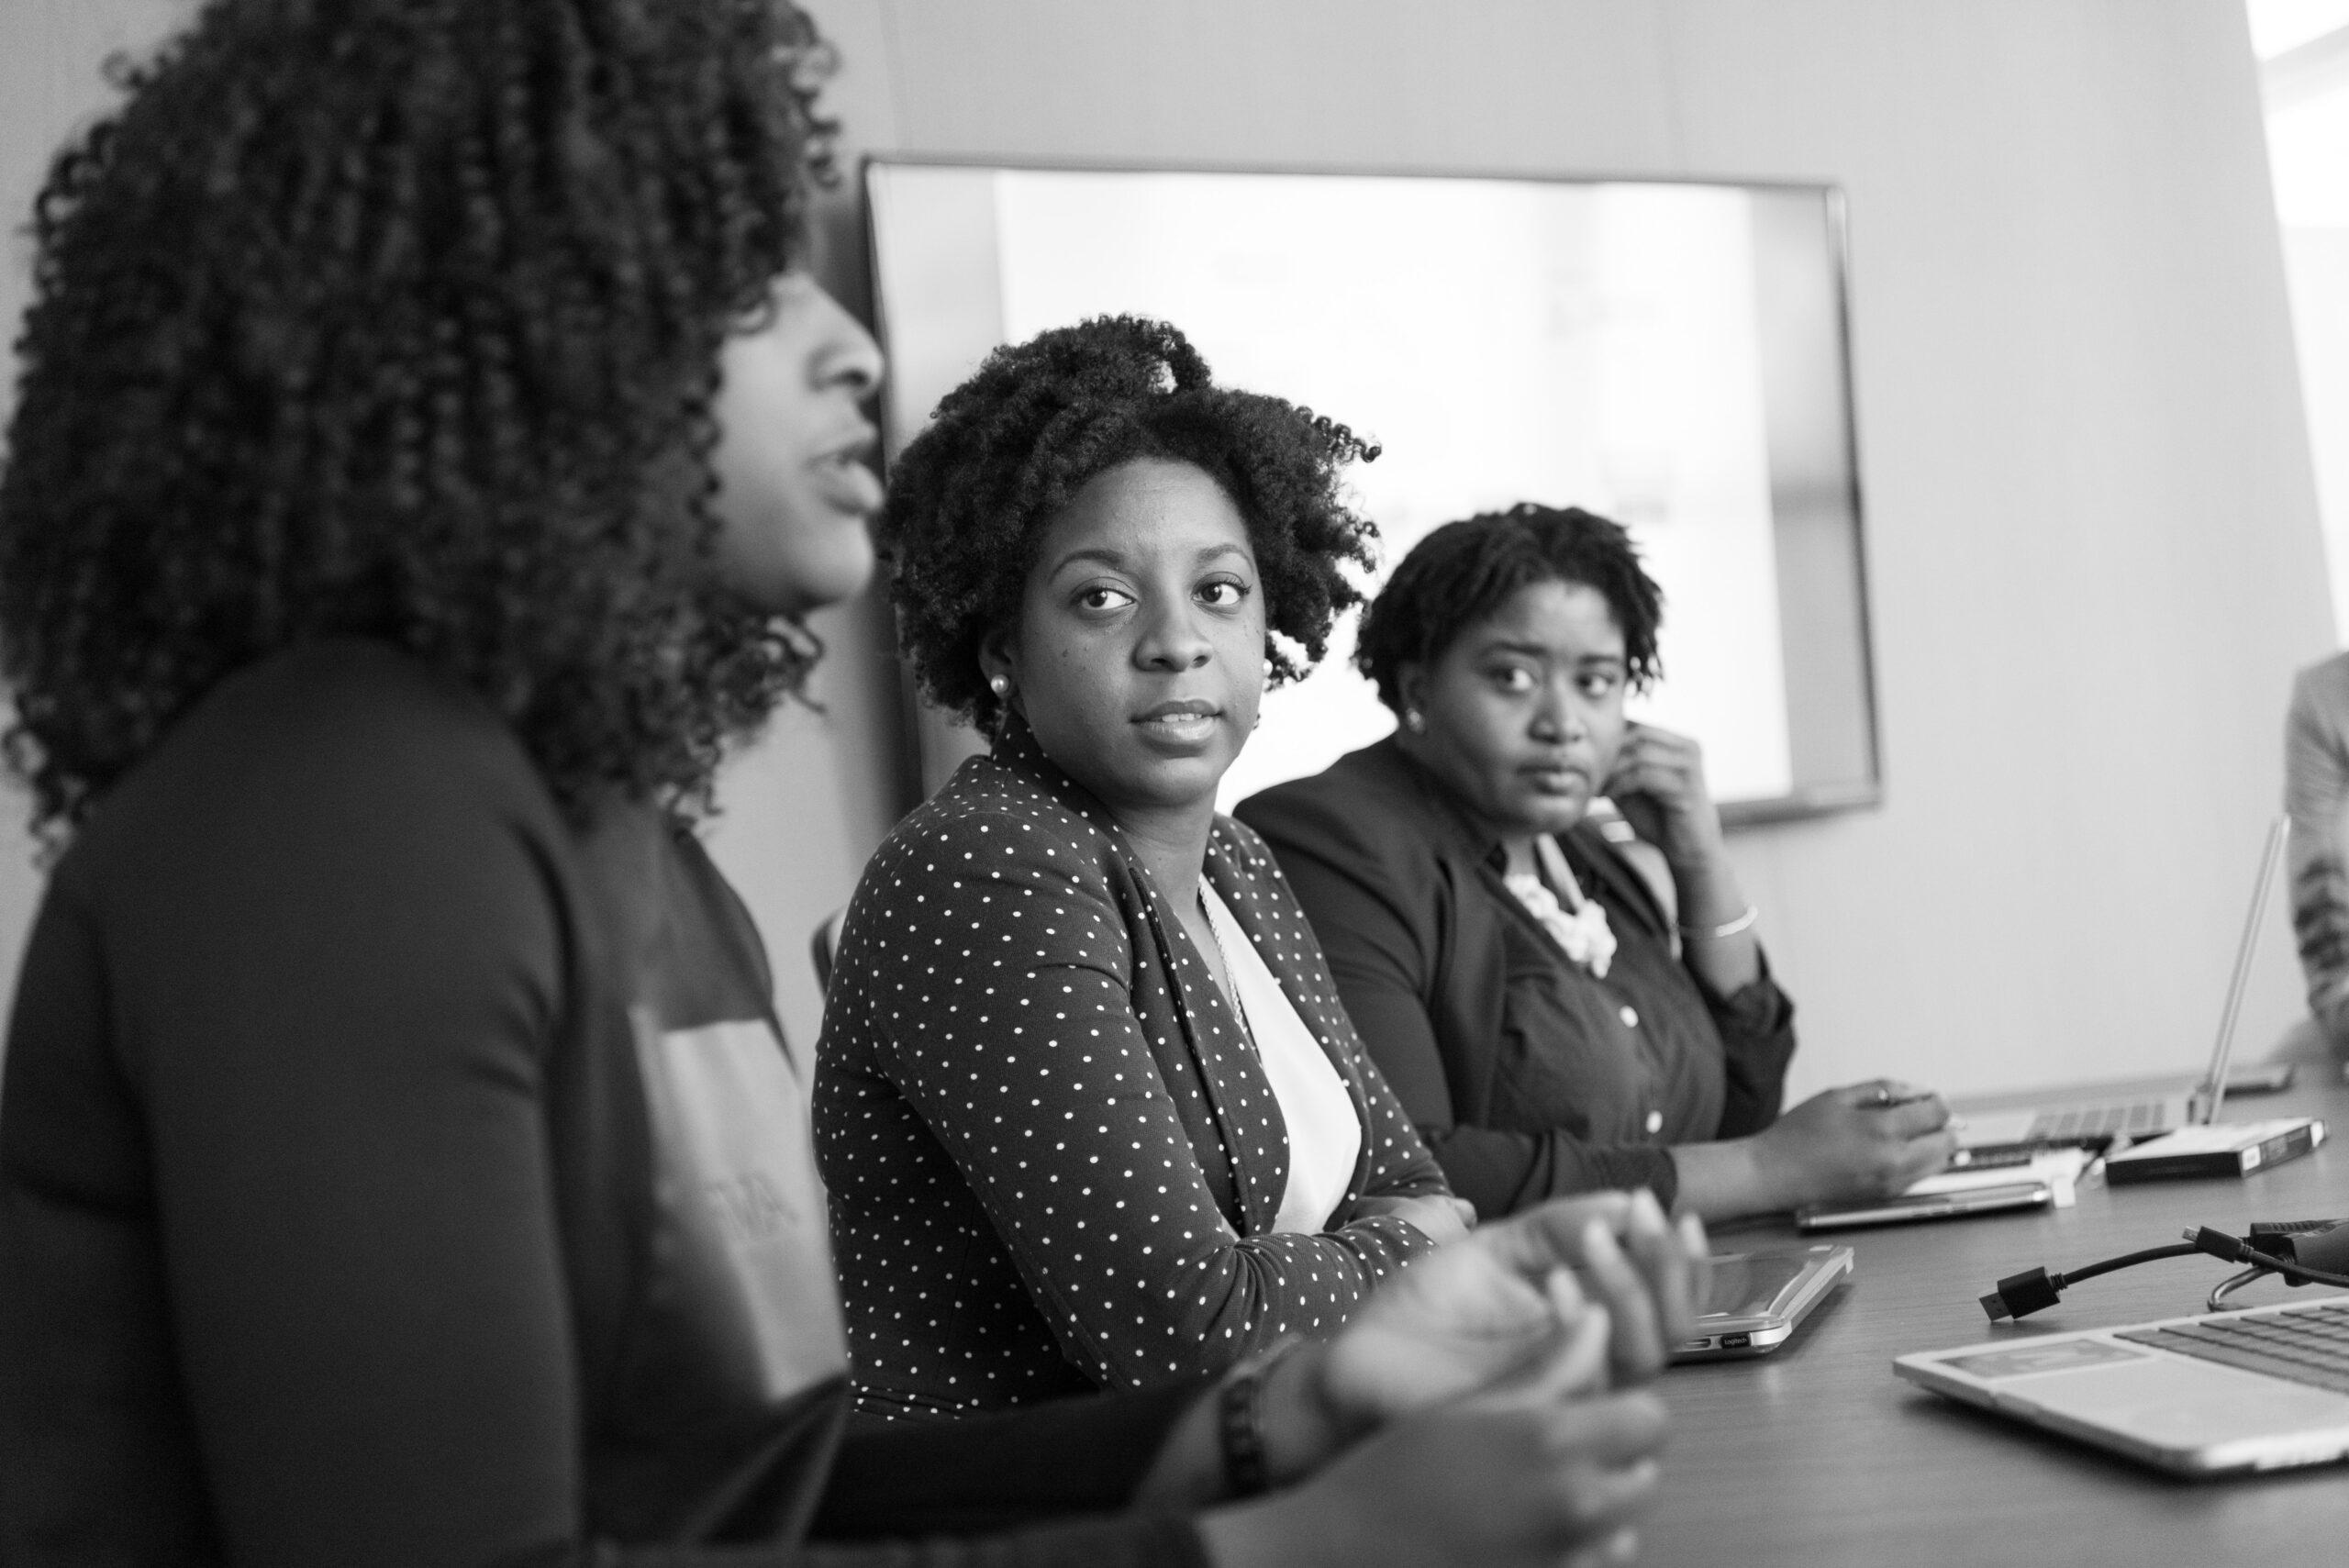 Black women in politics, Black women, Black community, representation